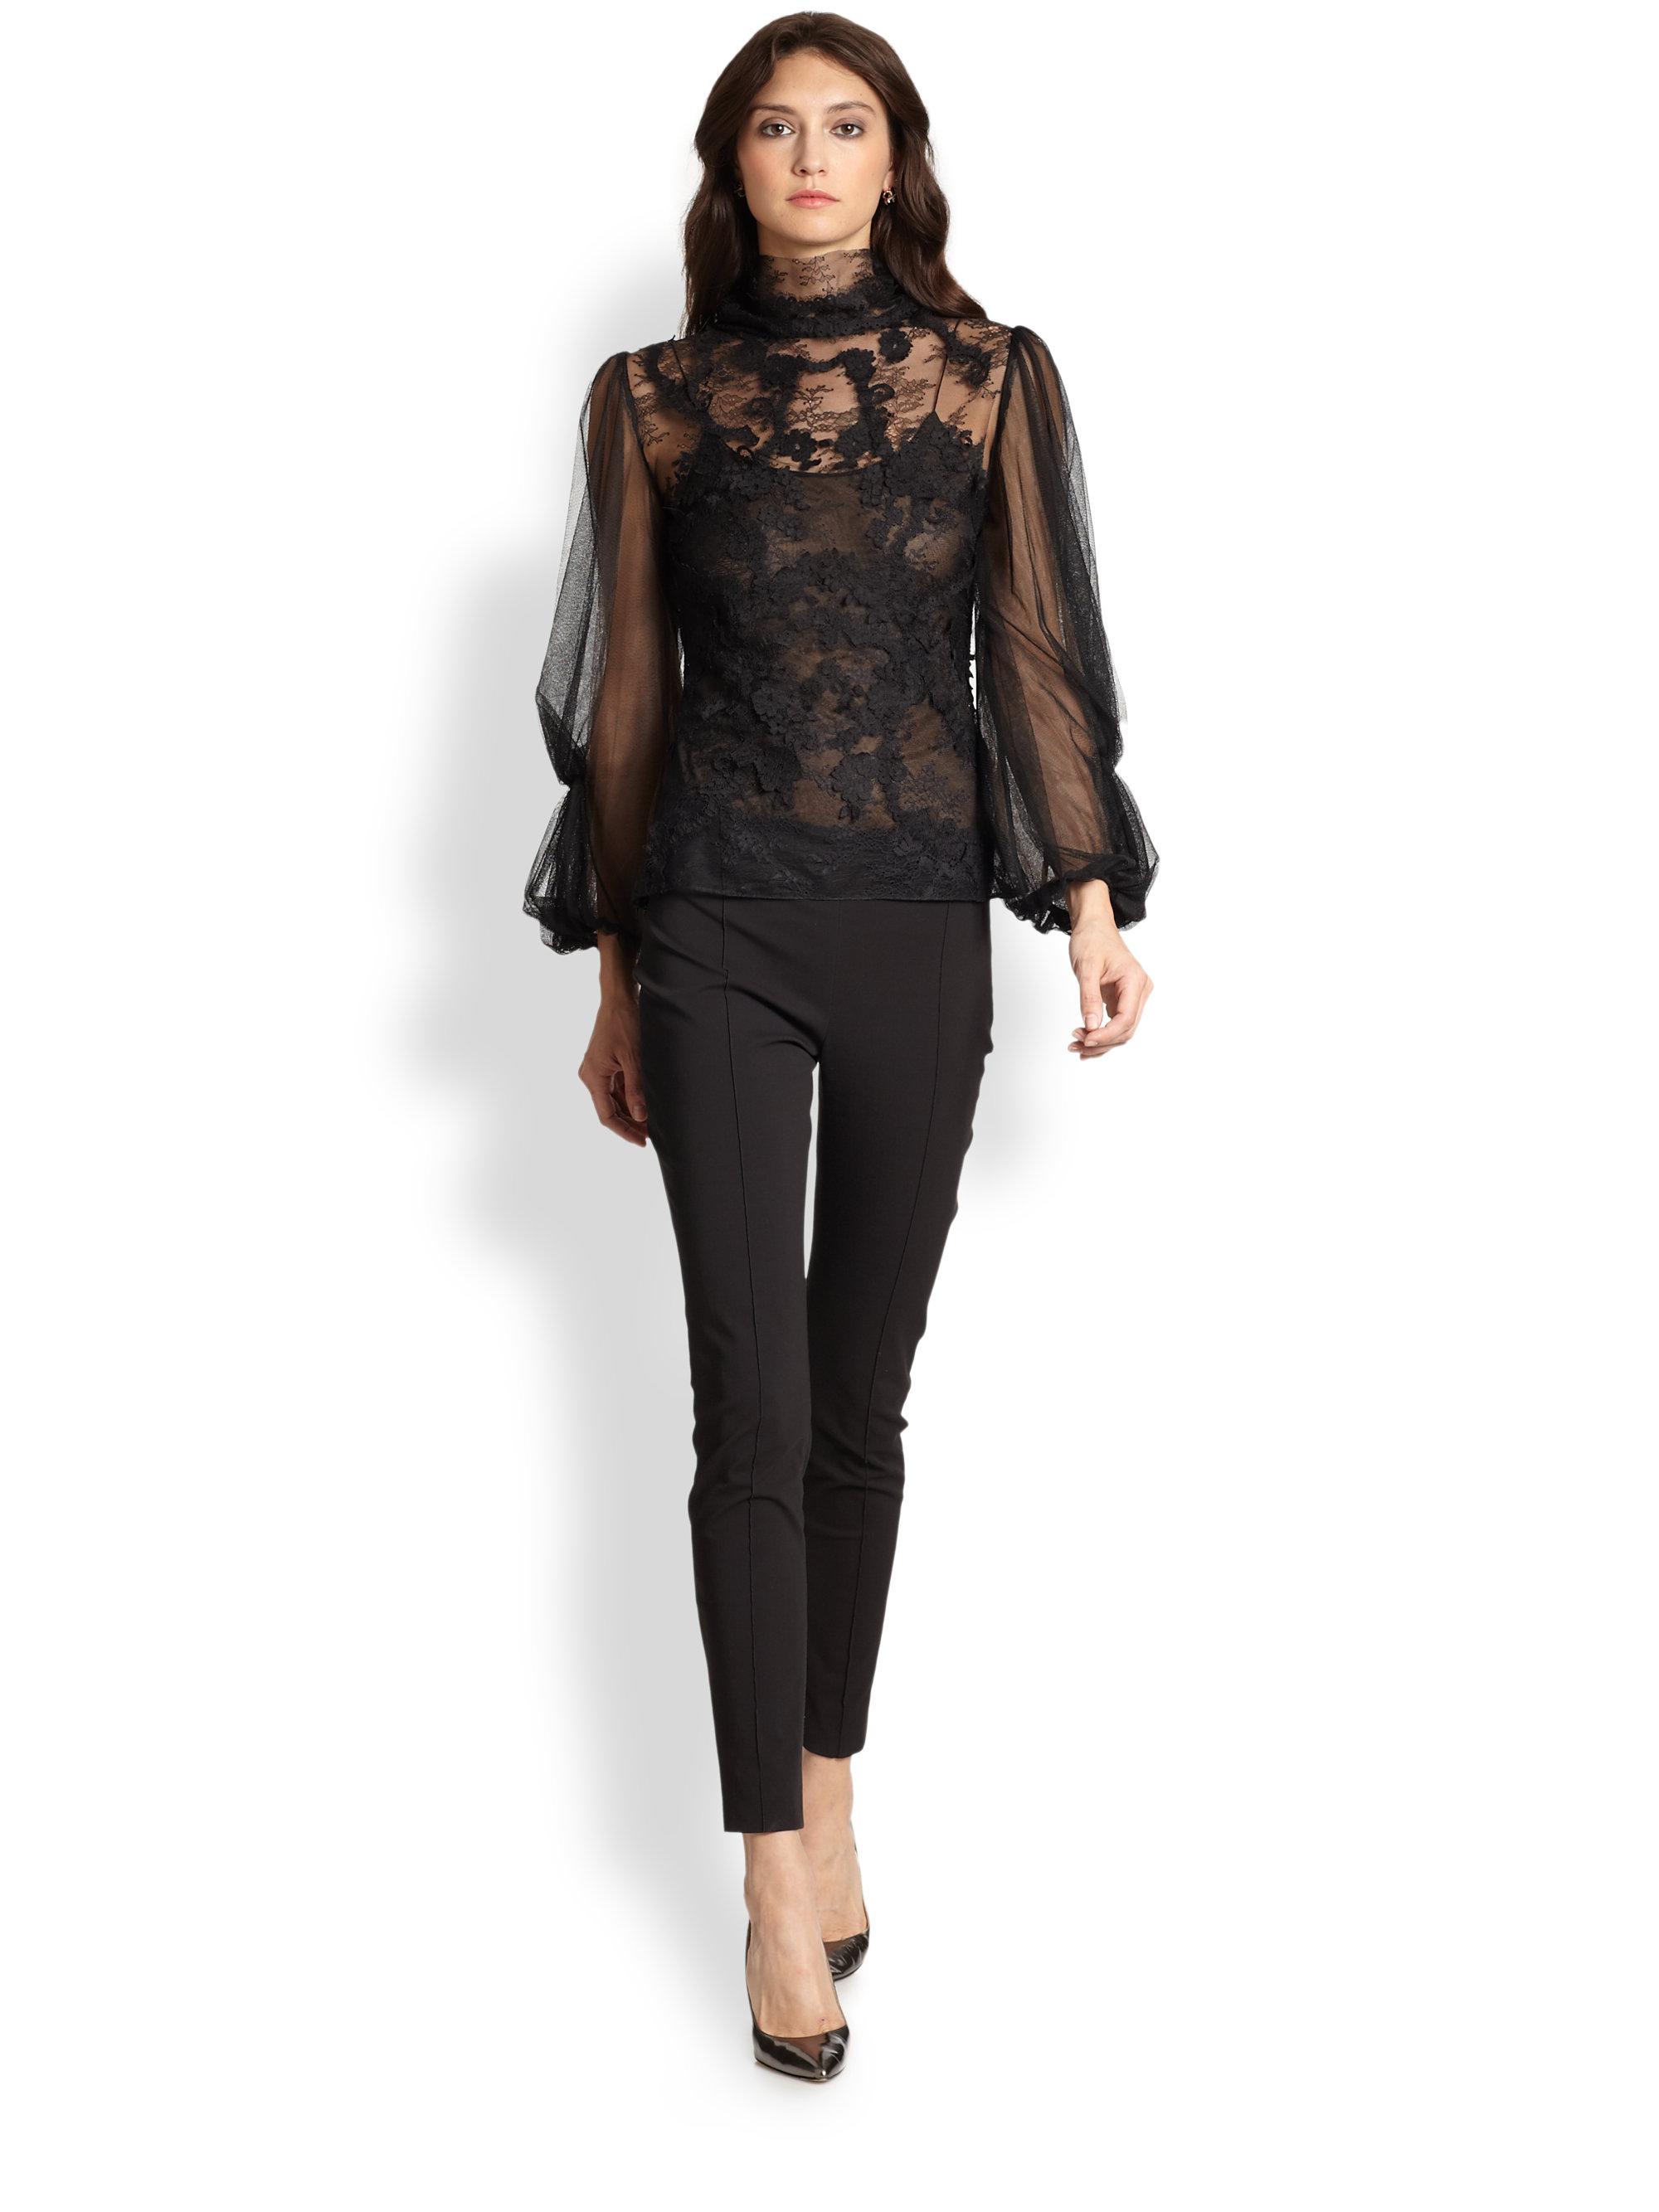 8386611d8a9 Long Sleeve Black Lace T Shirt - DREAMWORKS